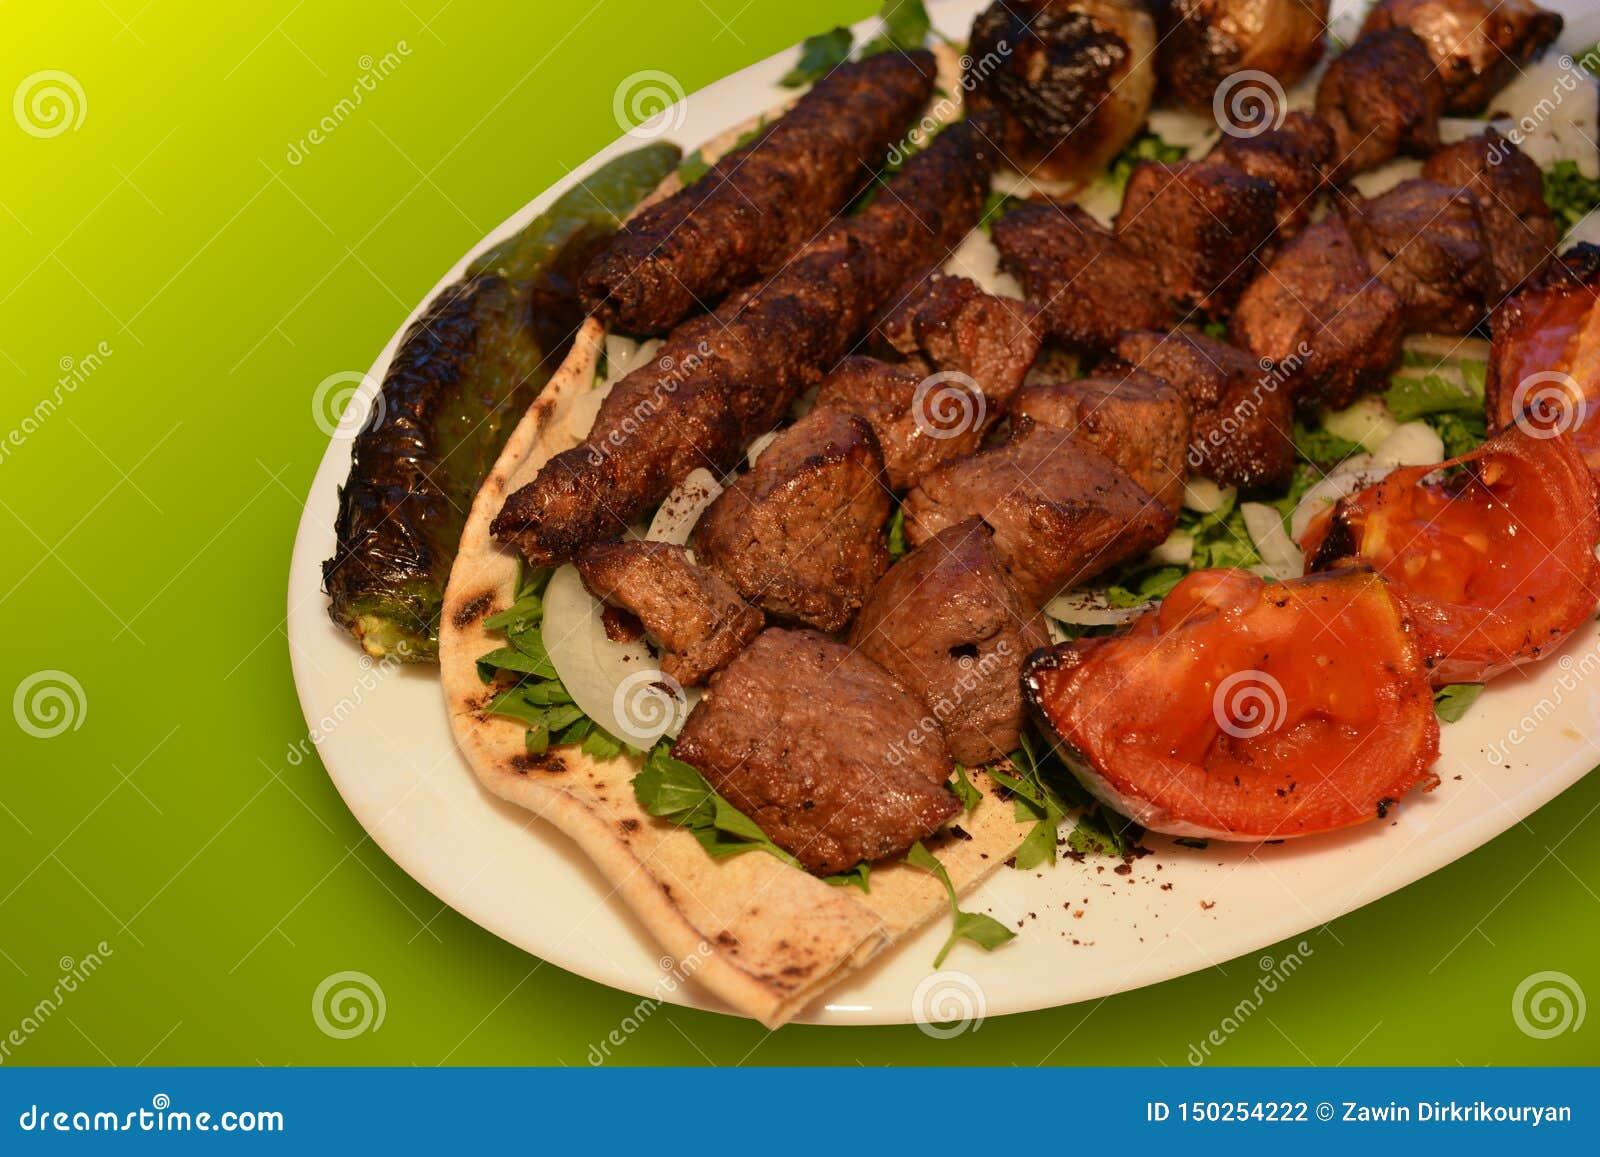 Kebab, Beef Barbecue Photography, Restaurant Menu Photo